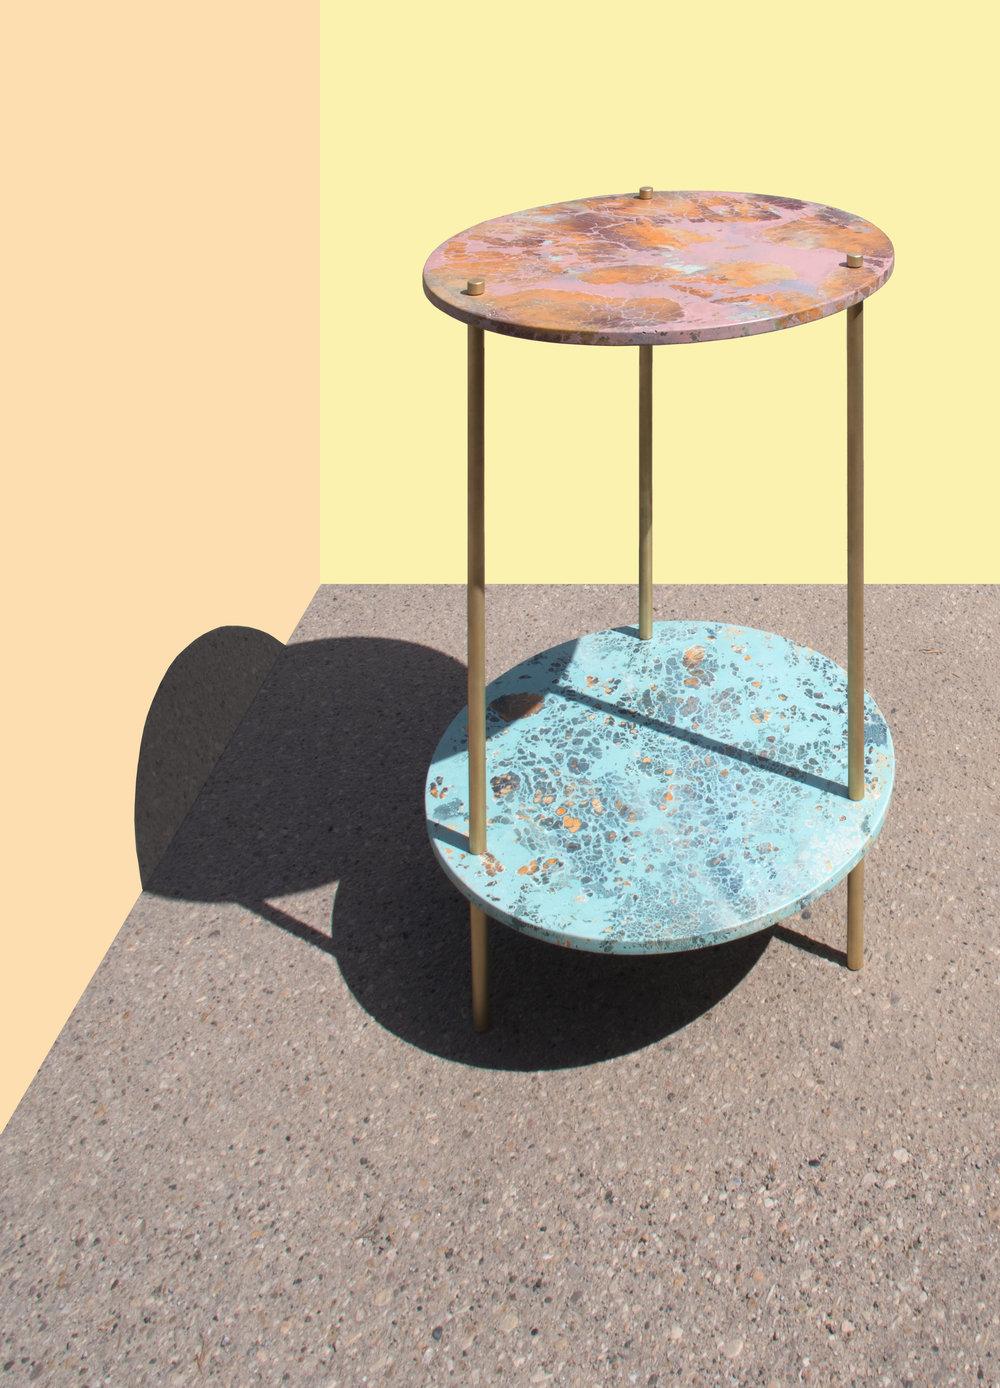 17Ambrosia Table_Pink Mint_IMGP9728.jpg